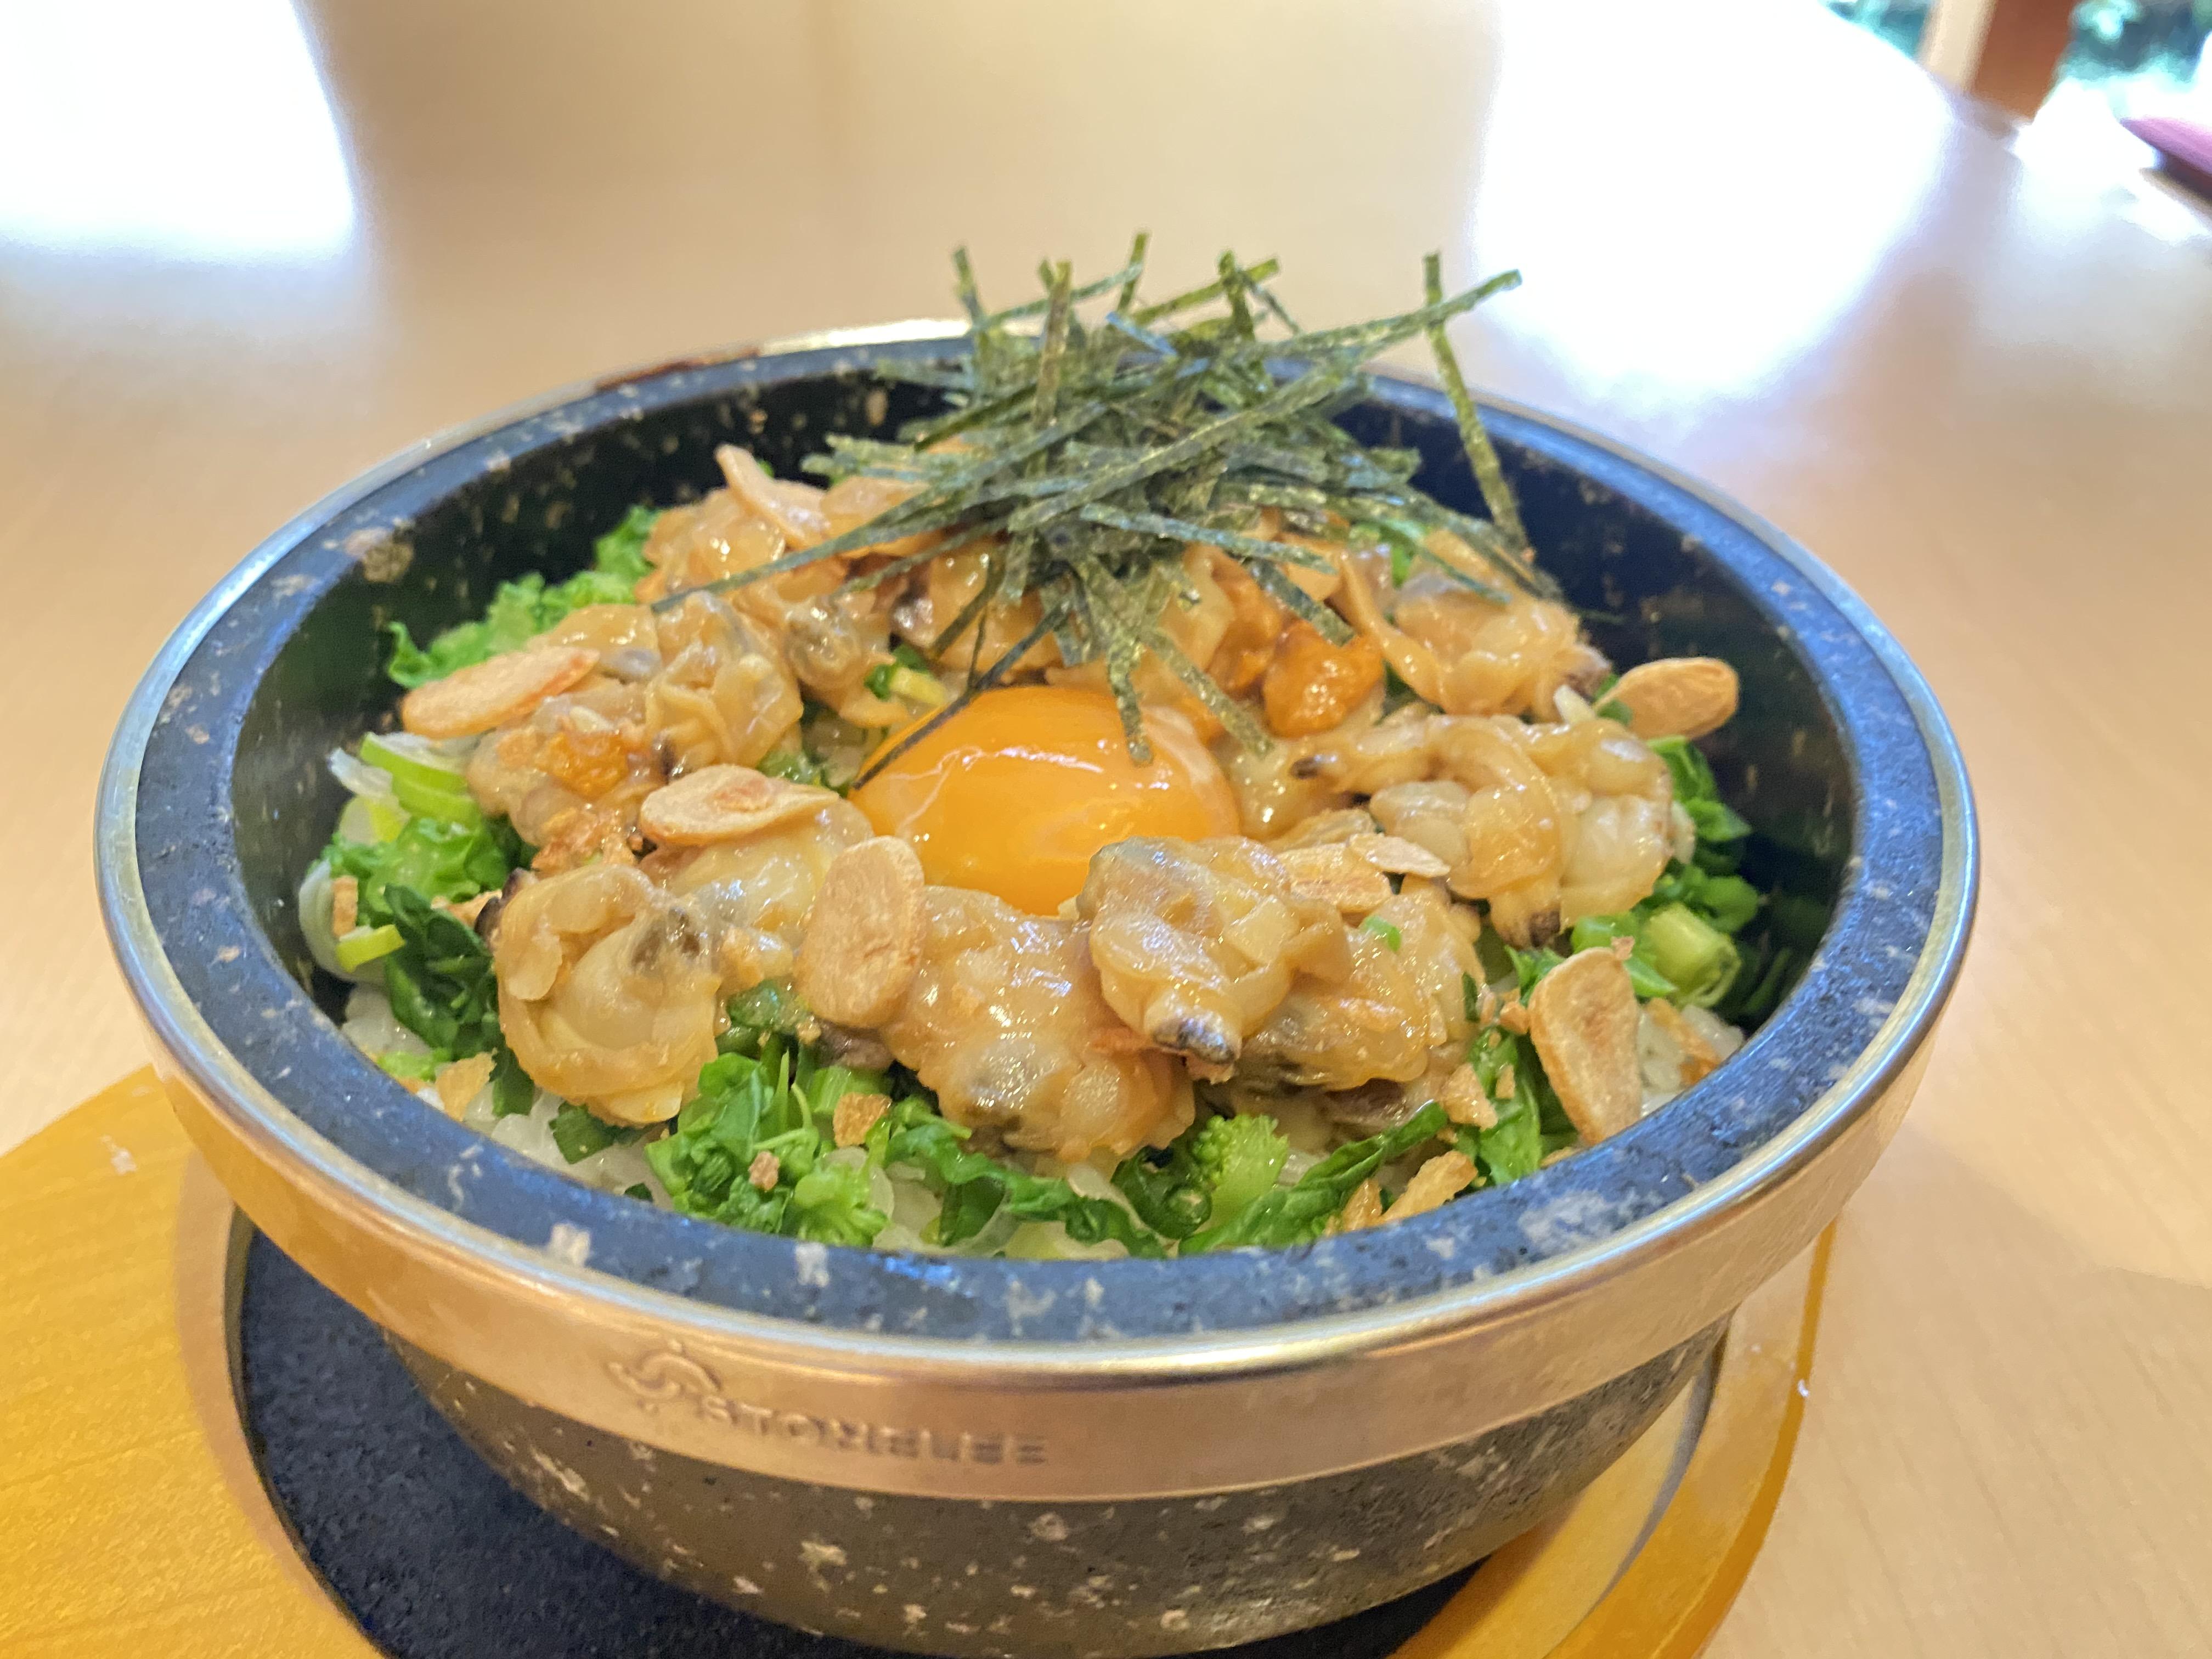 【NEW】あさりの石焼ガーリックバターライス<br />ミニサラダ・スープ・ドリンク付